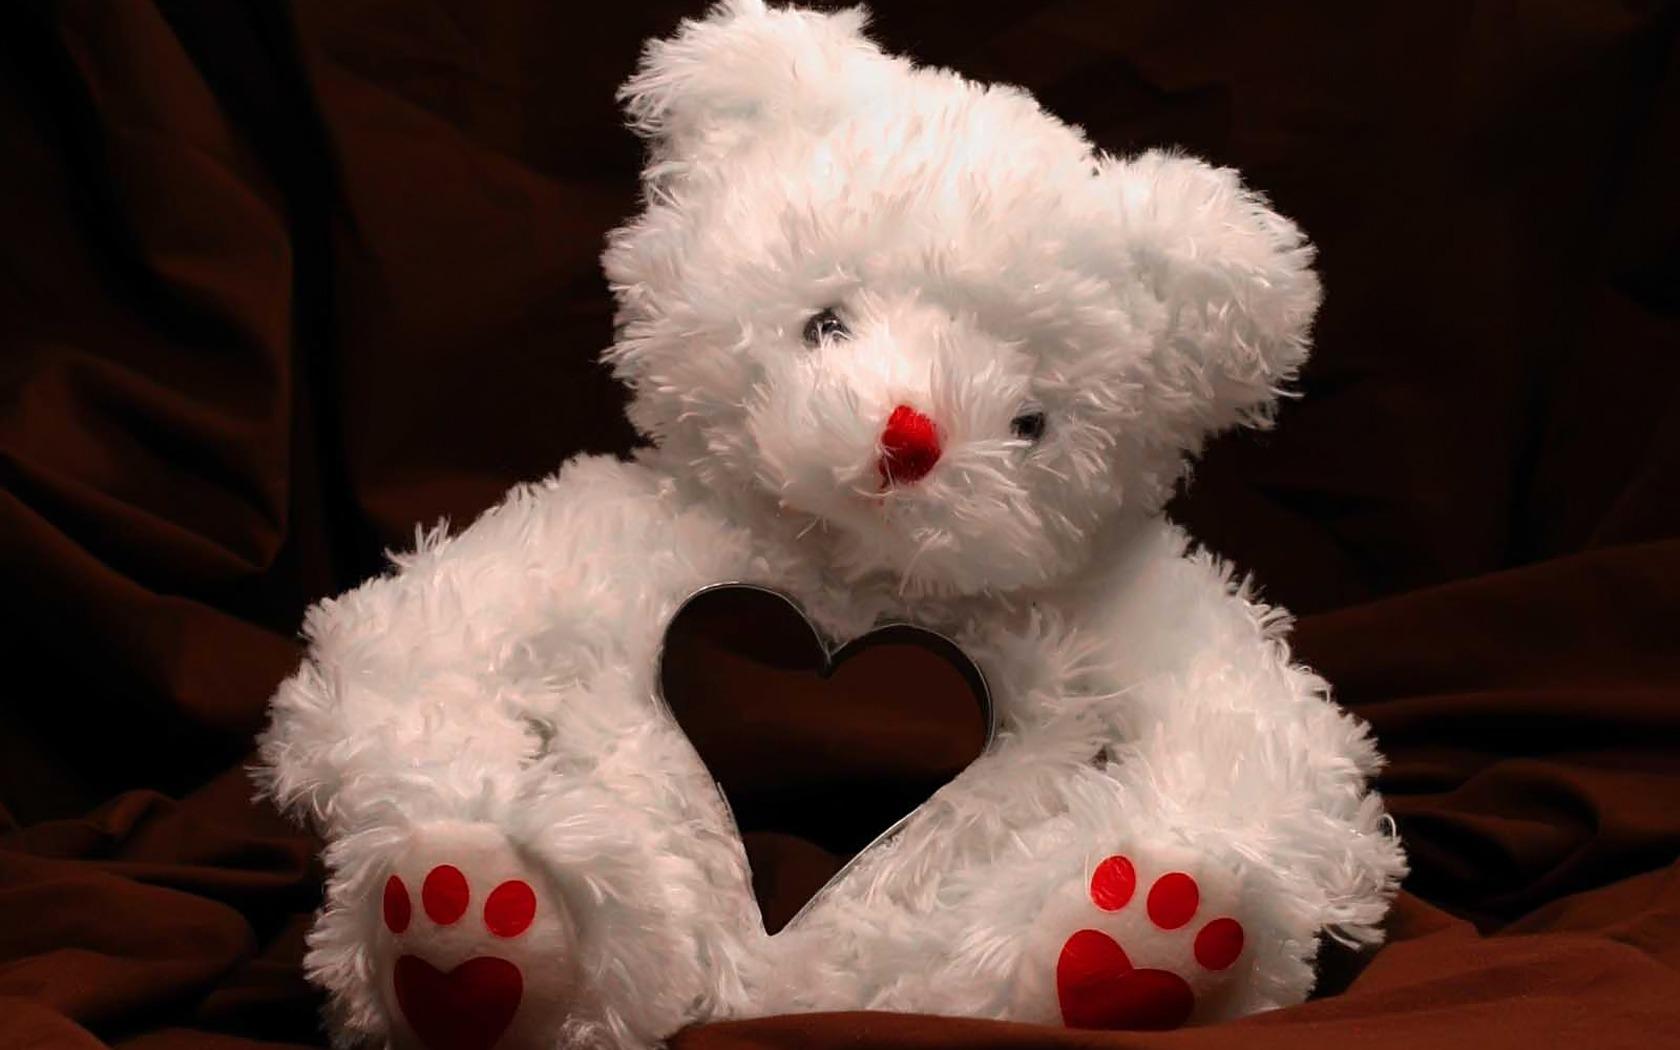 Valentine's Teddy Bear | 1680 x 1050 | Download | Close